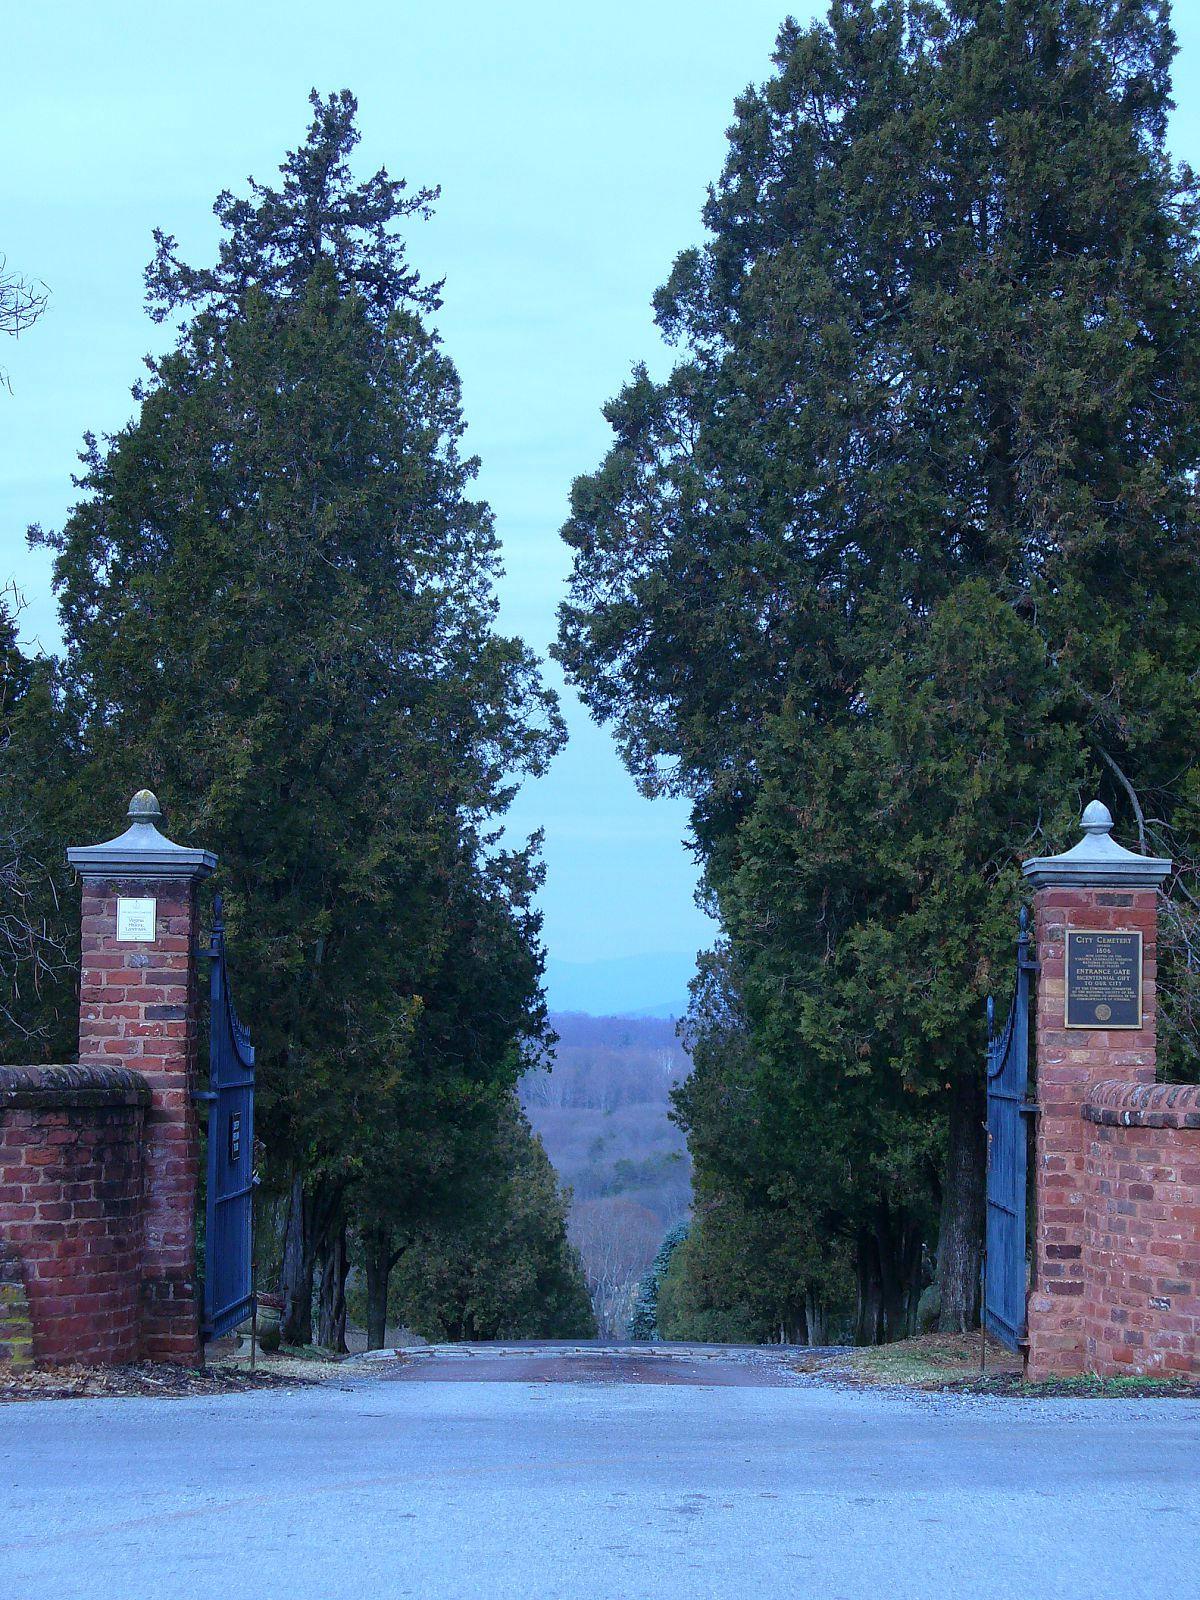 http://1.bp.blogspot.com/-avbQywc9xFw/TiBdk6GrNYI/AAAAAAAABD0/segE_1CwZ_0/s1600/entrance1.jpg